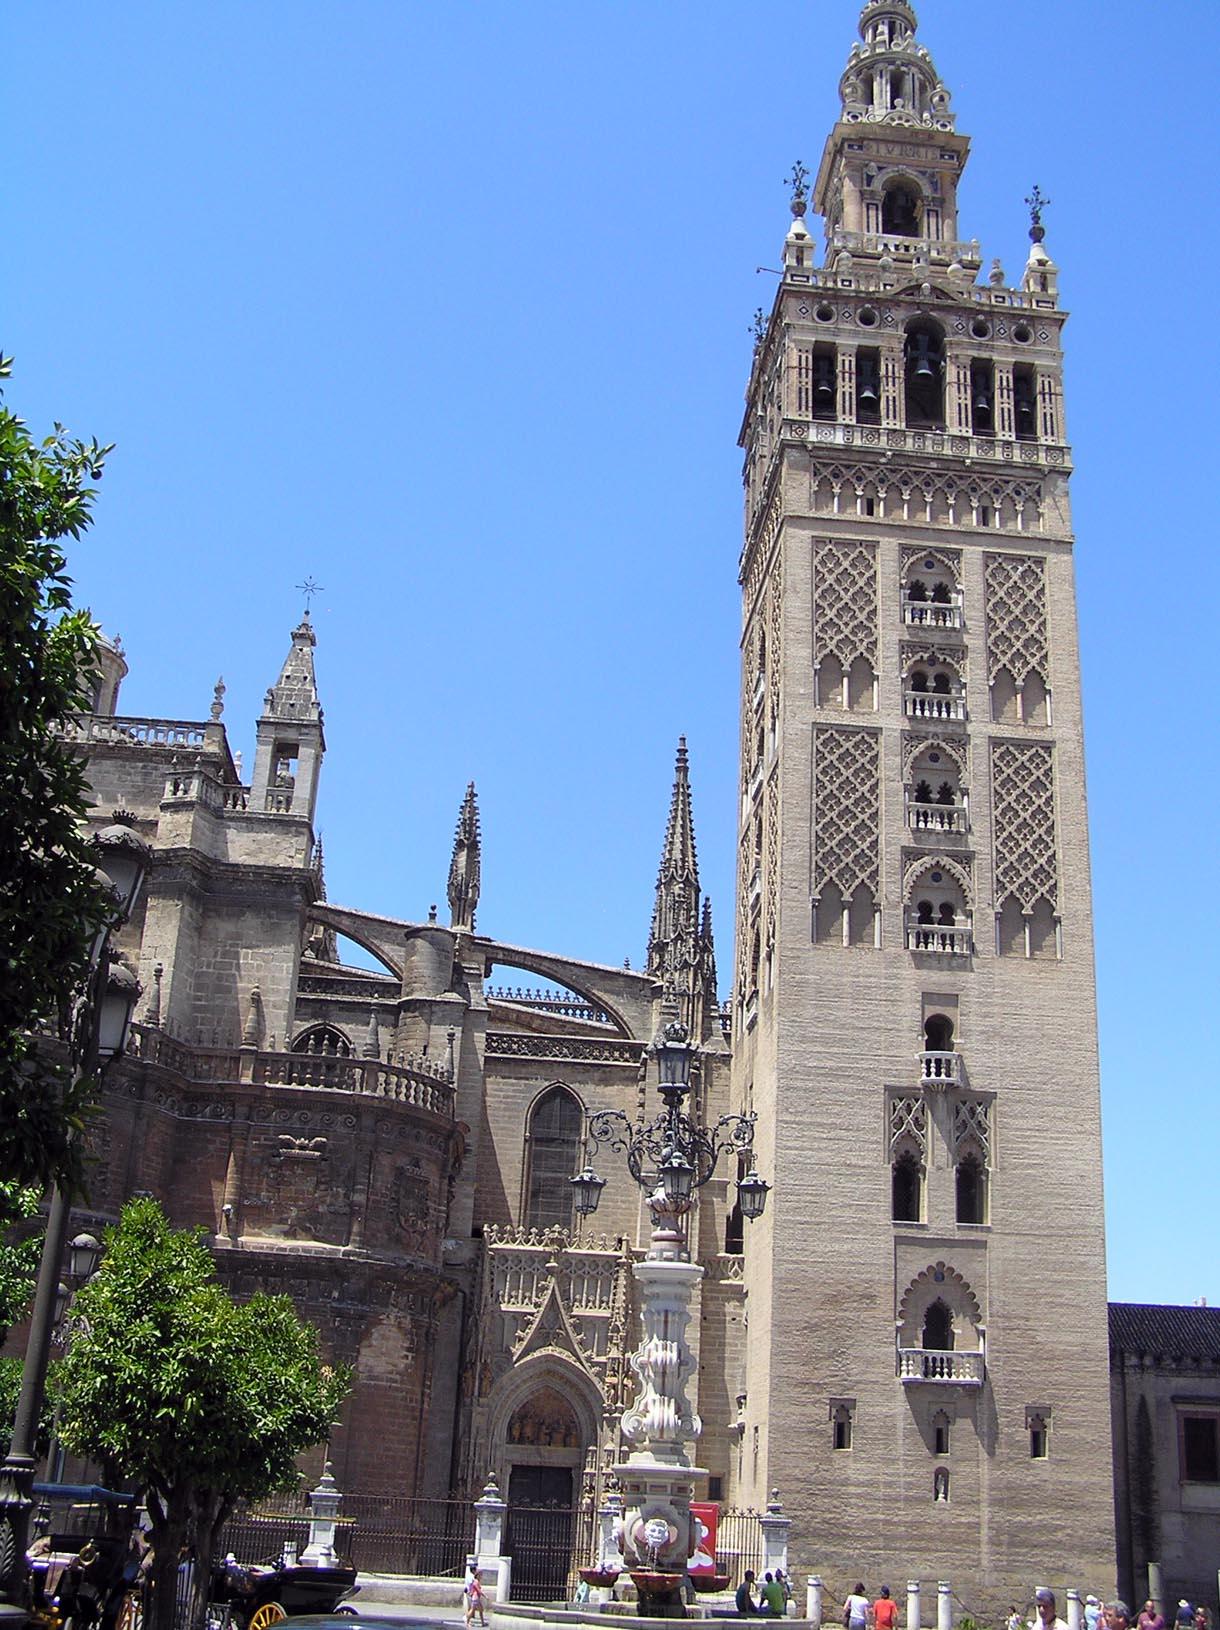 Catedral de sevilla portal fuenterrebollo for Exterior catedral de sevilla